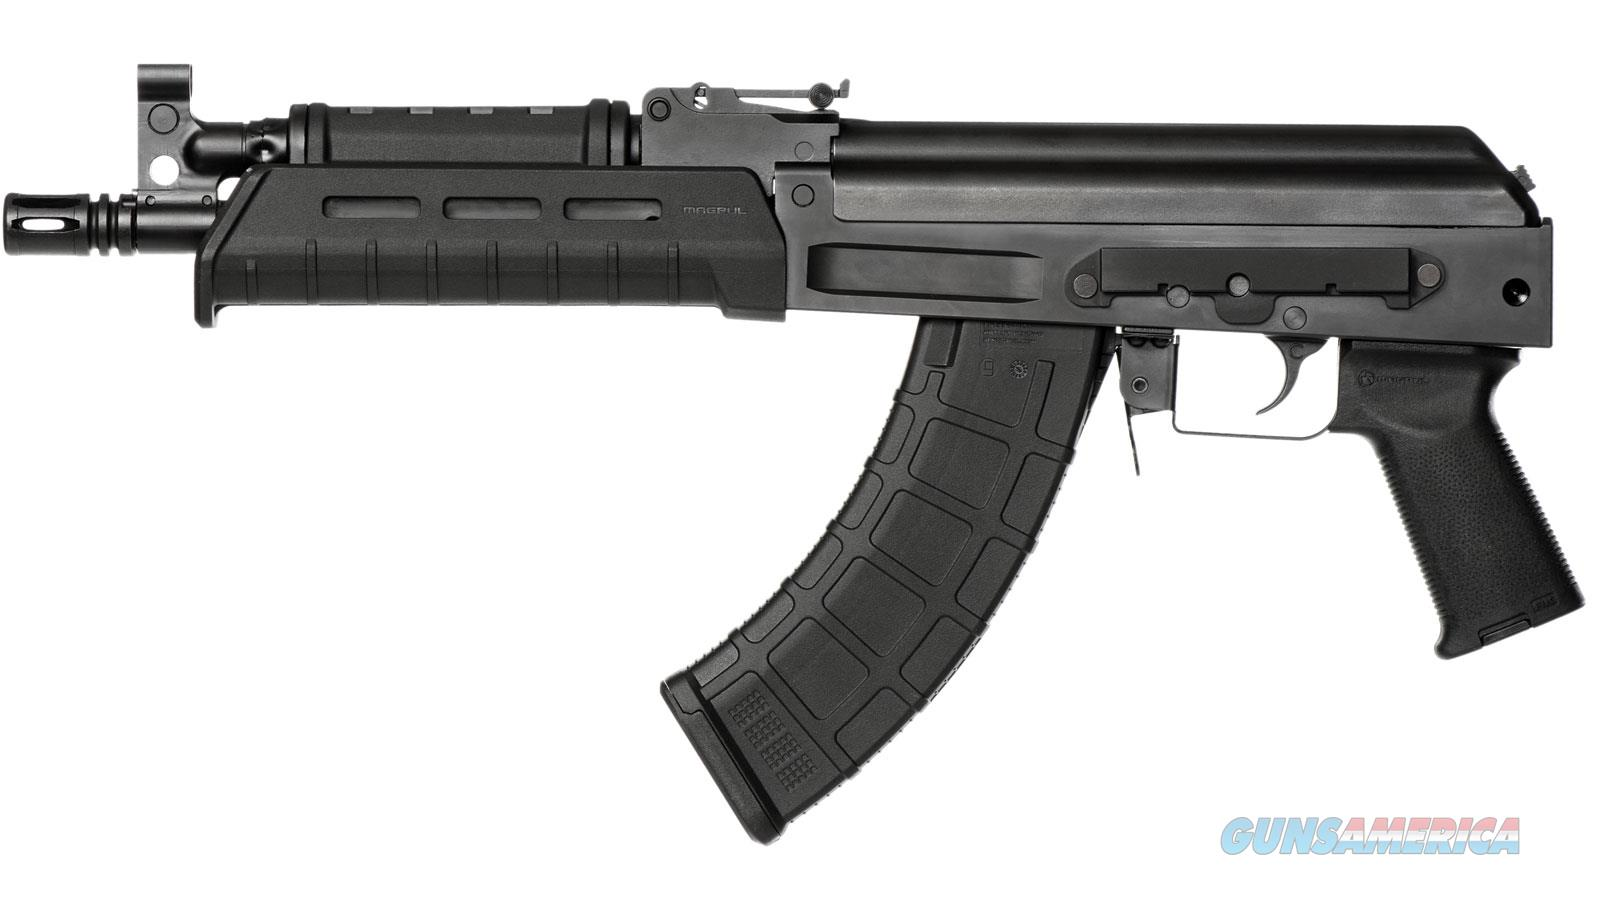 Century Arms C39 V2 Pistol w/Milled Receiver  Guns > Pistols > Century International Arms - Pistols > Pistols